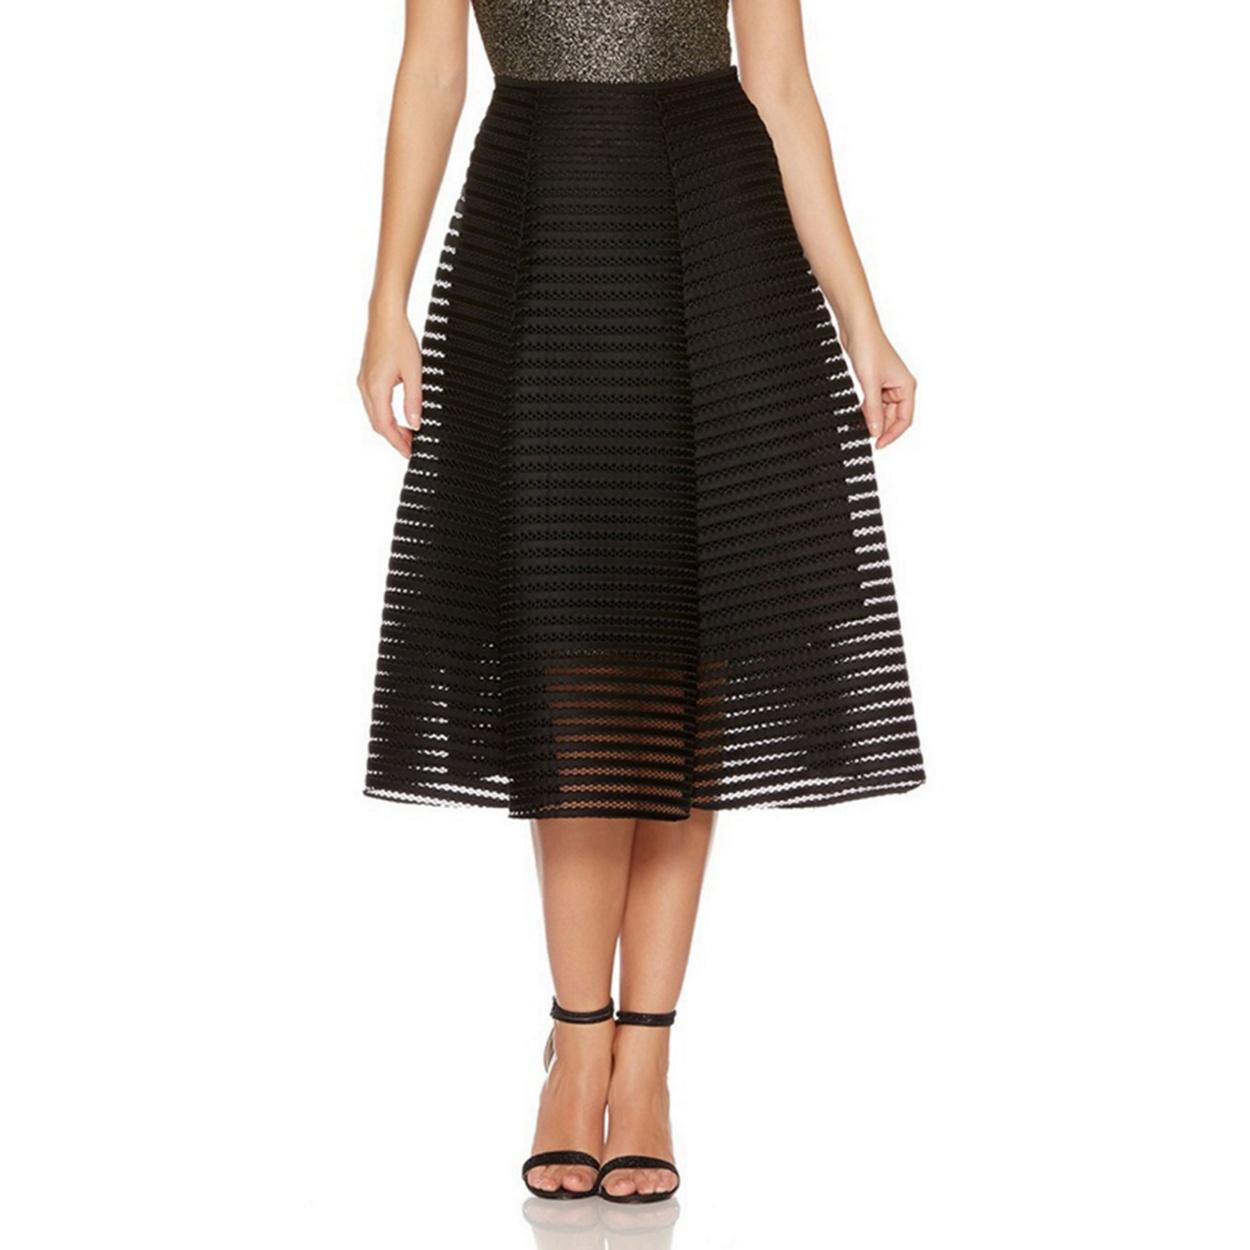 Midi - Skirts - Women | Debenhams